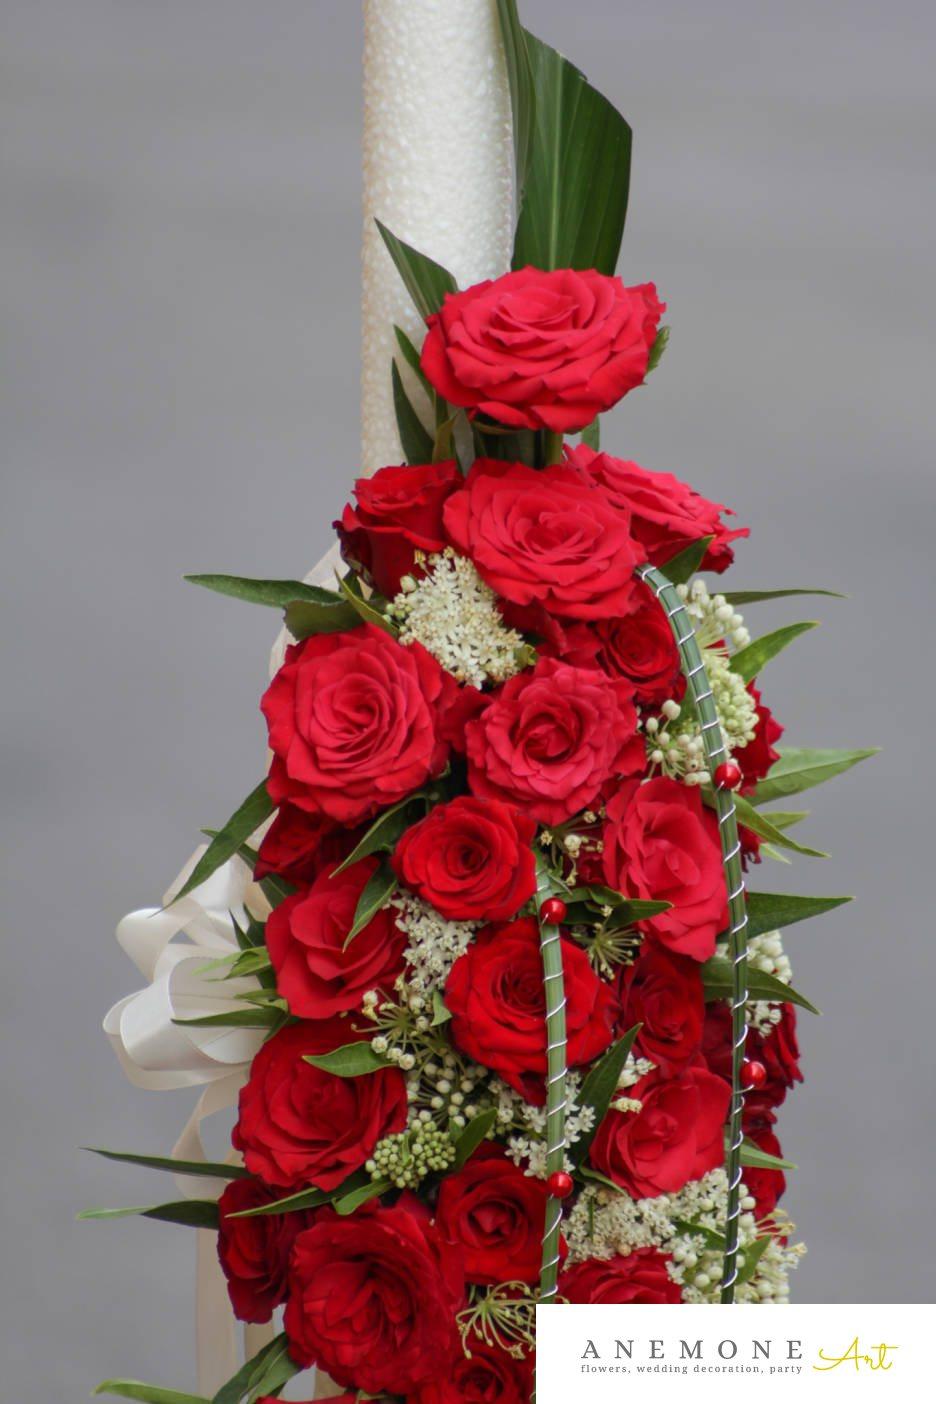 Poza, foto cu Flori de nunta alb, gipsofila, lumanare cununie, perle, rosu, sebum, trandafiri in Arad, Timisoara, Oradea (wedding flowers, bouquets) nunta Arad, Timisoara, Oradea